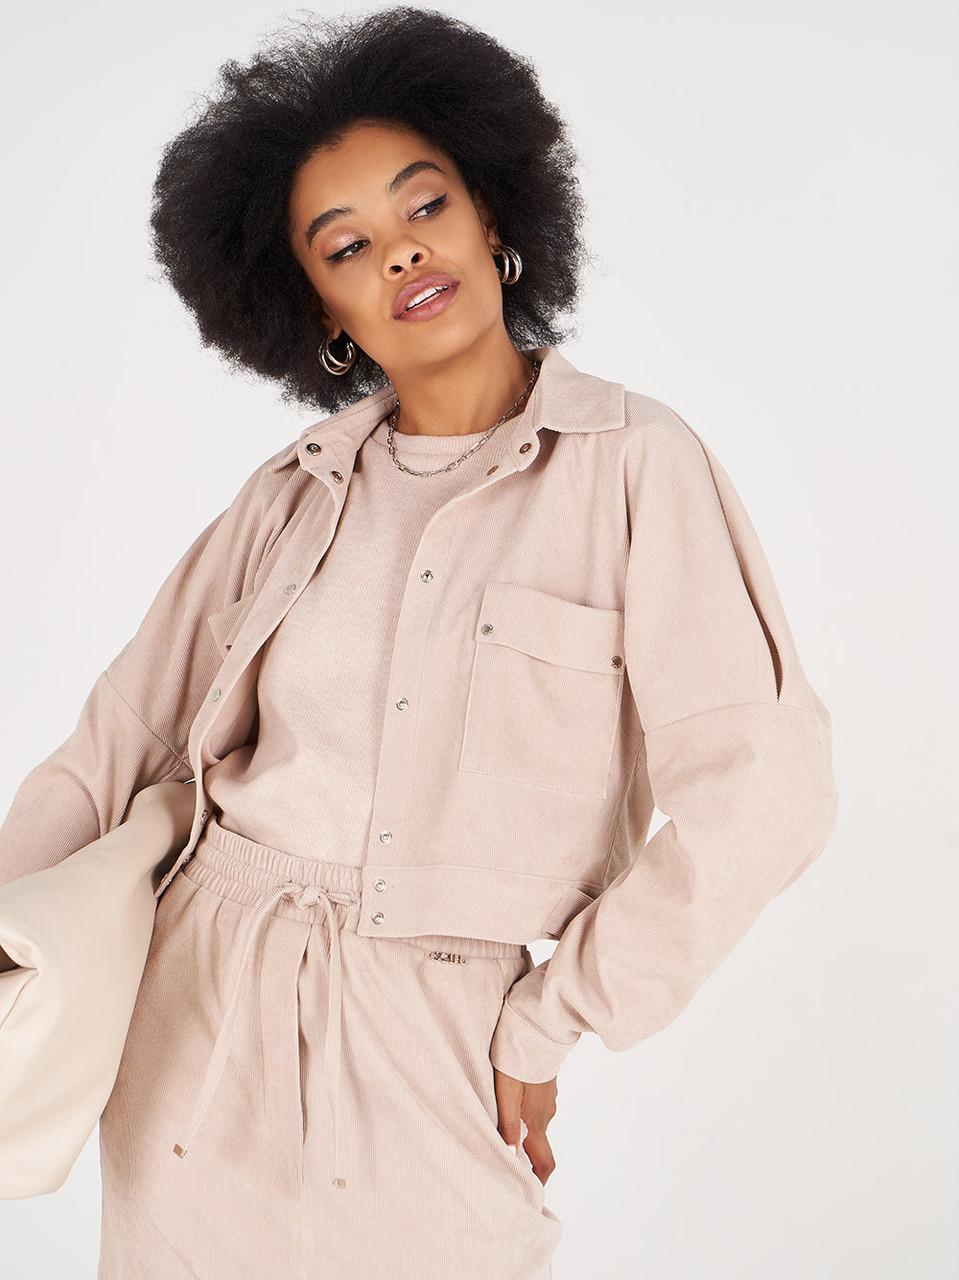 Жіноча куртка мікровільвет коротка бежева SOLH MKSH2722